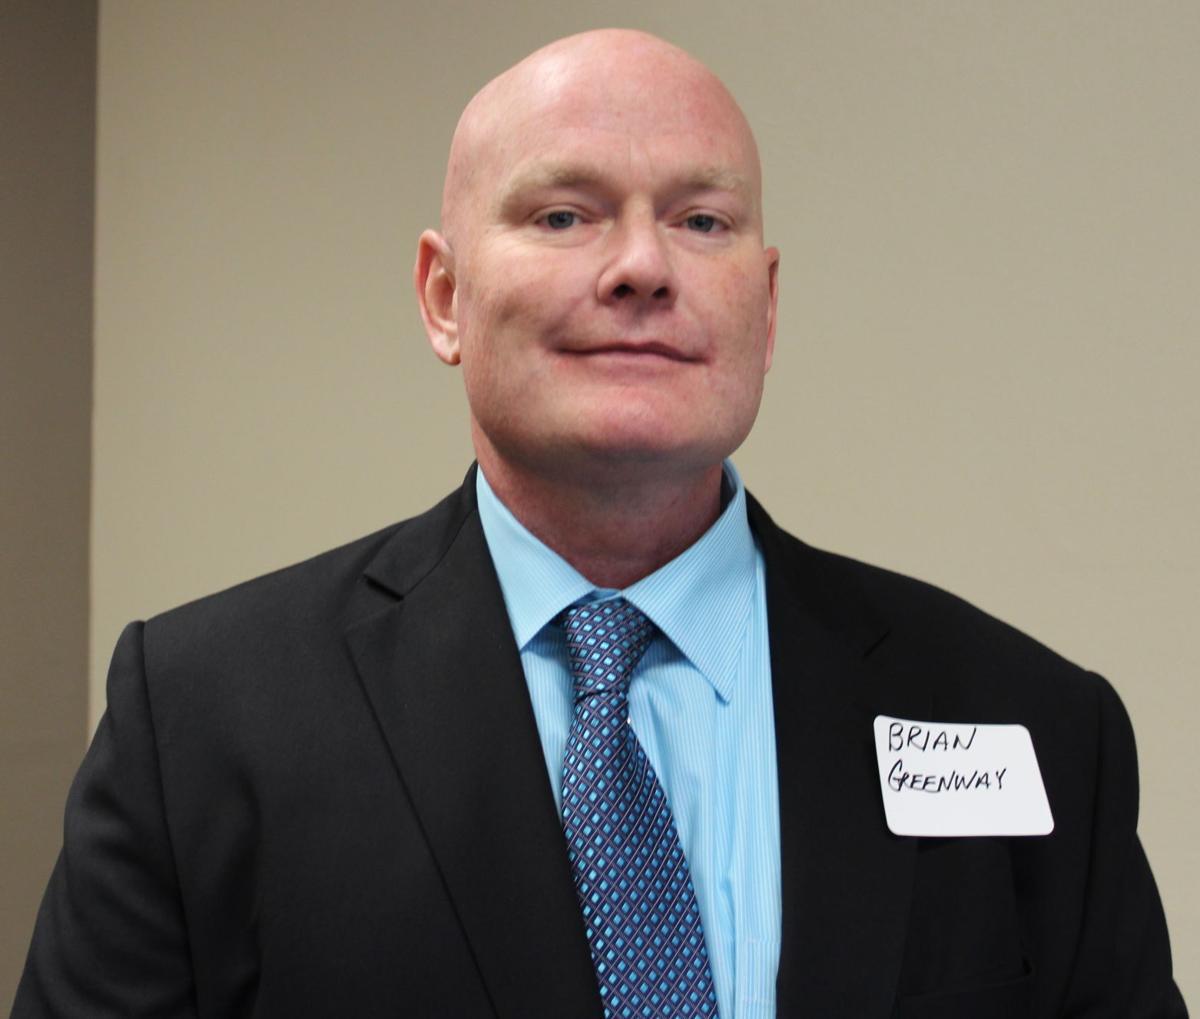 Brian Greenway.JPG